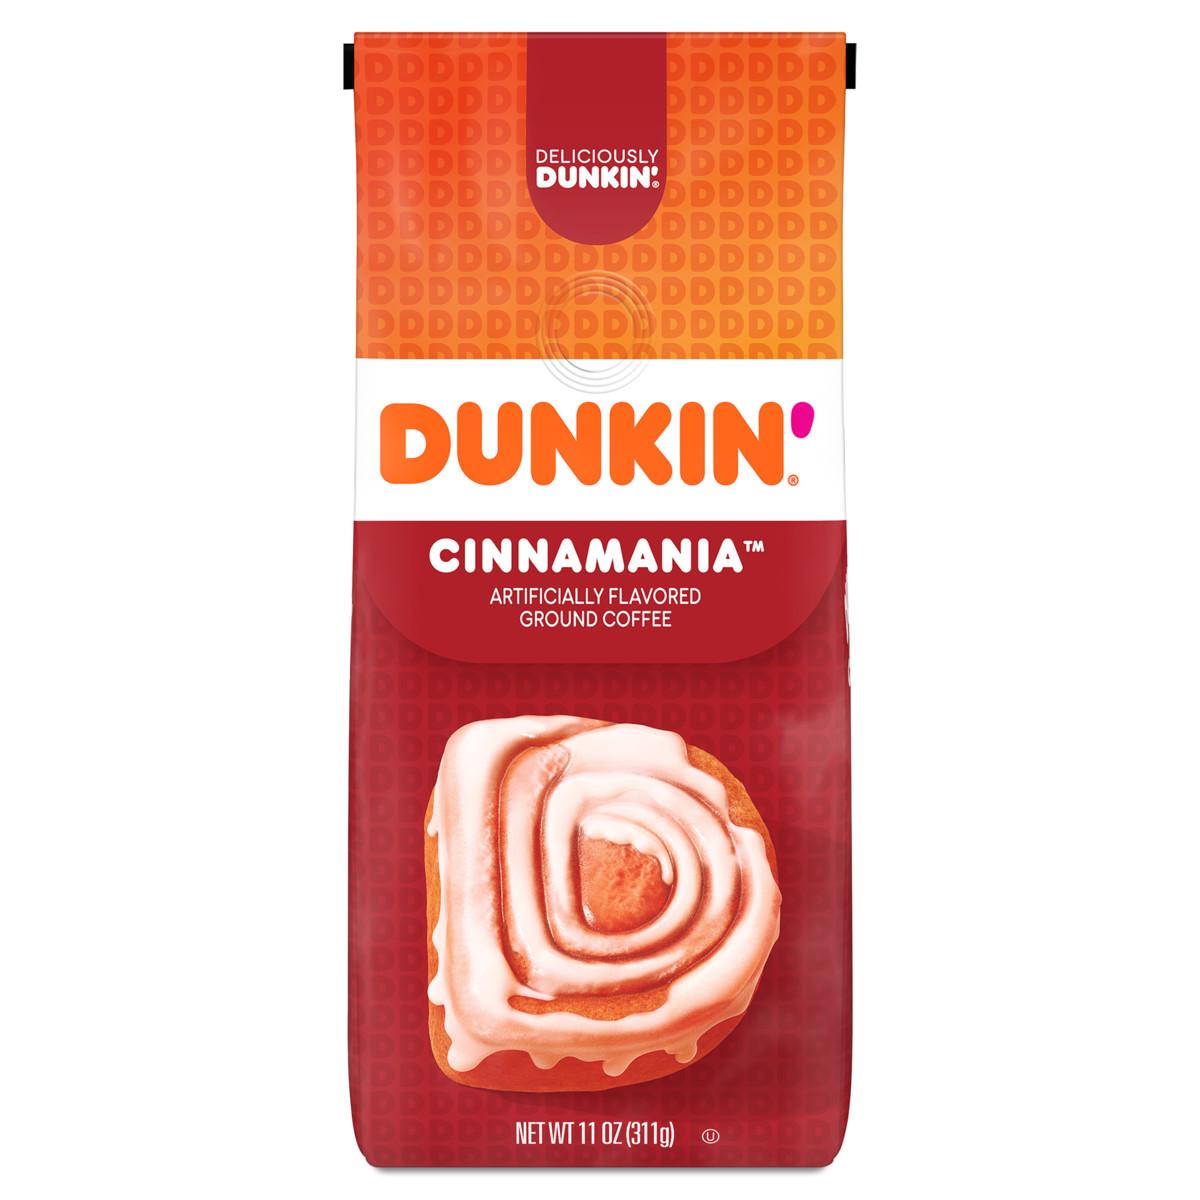 Dunkin'Cinnamania Ground Coffee